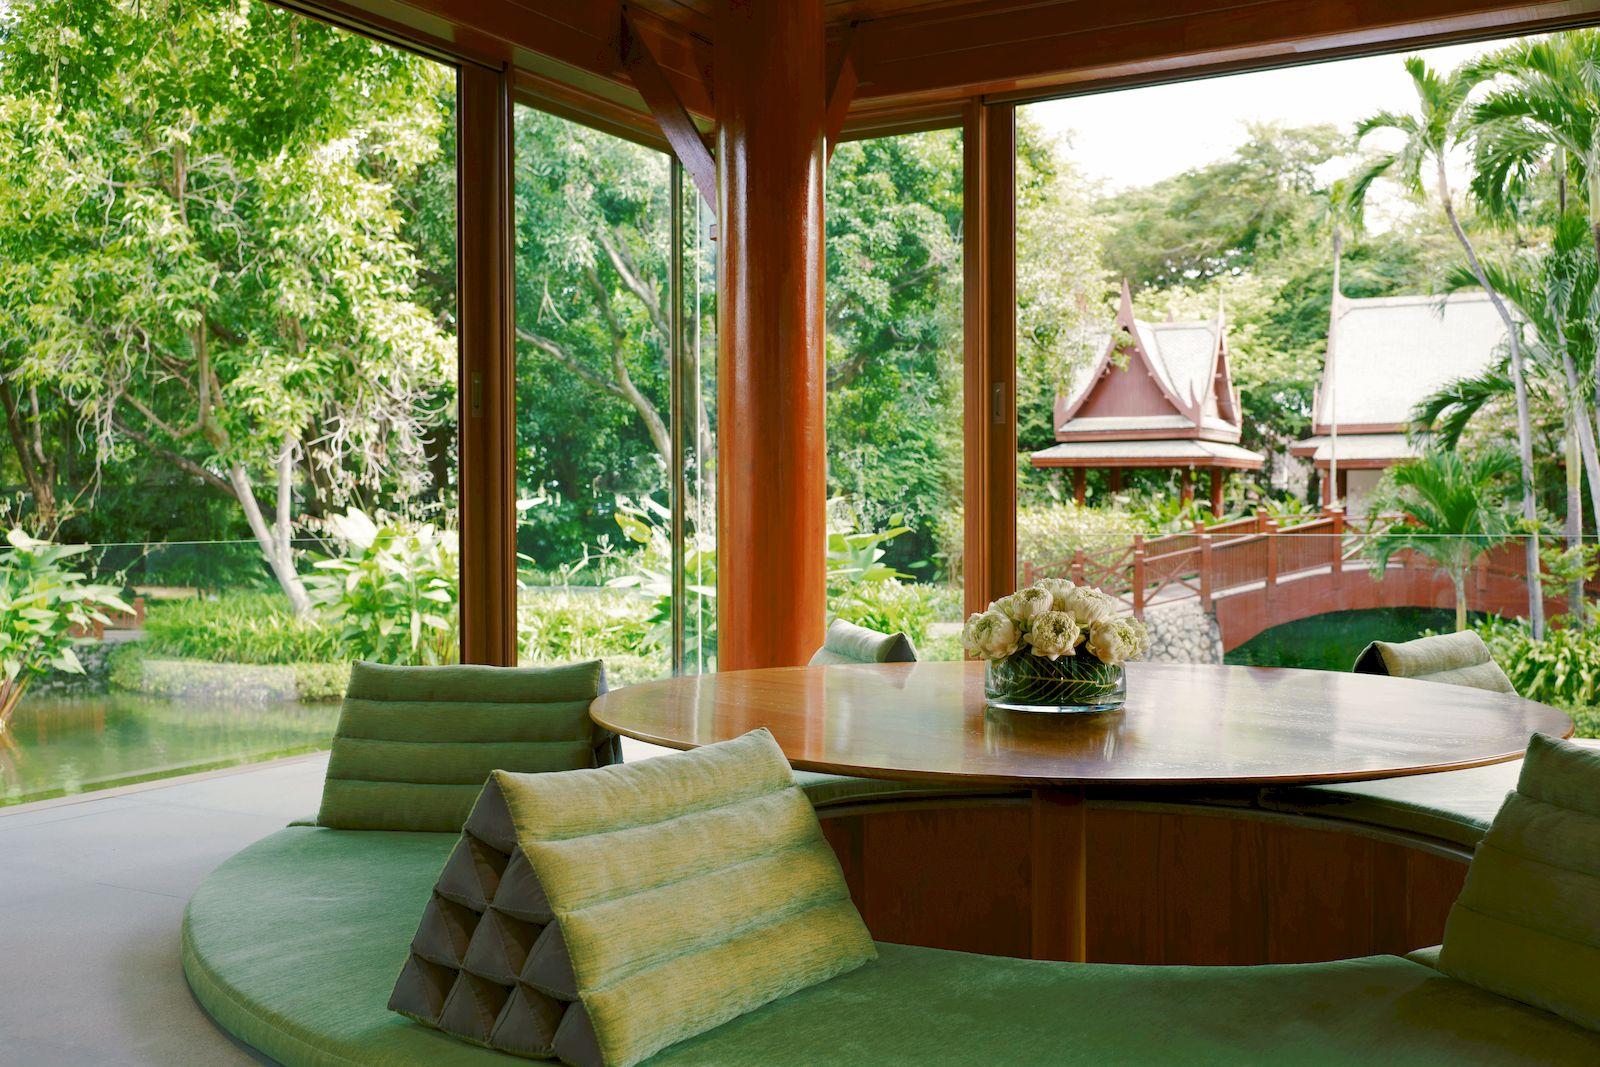 Reset and rejuvenate at Chiva-Somin Hua Hin, Thailand